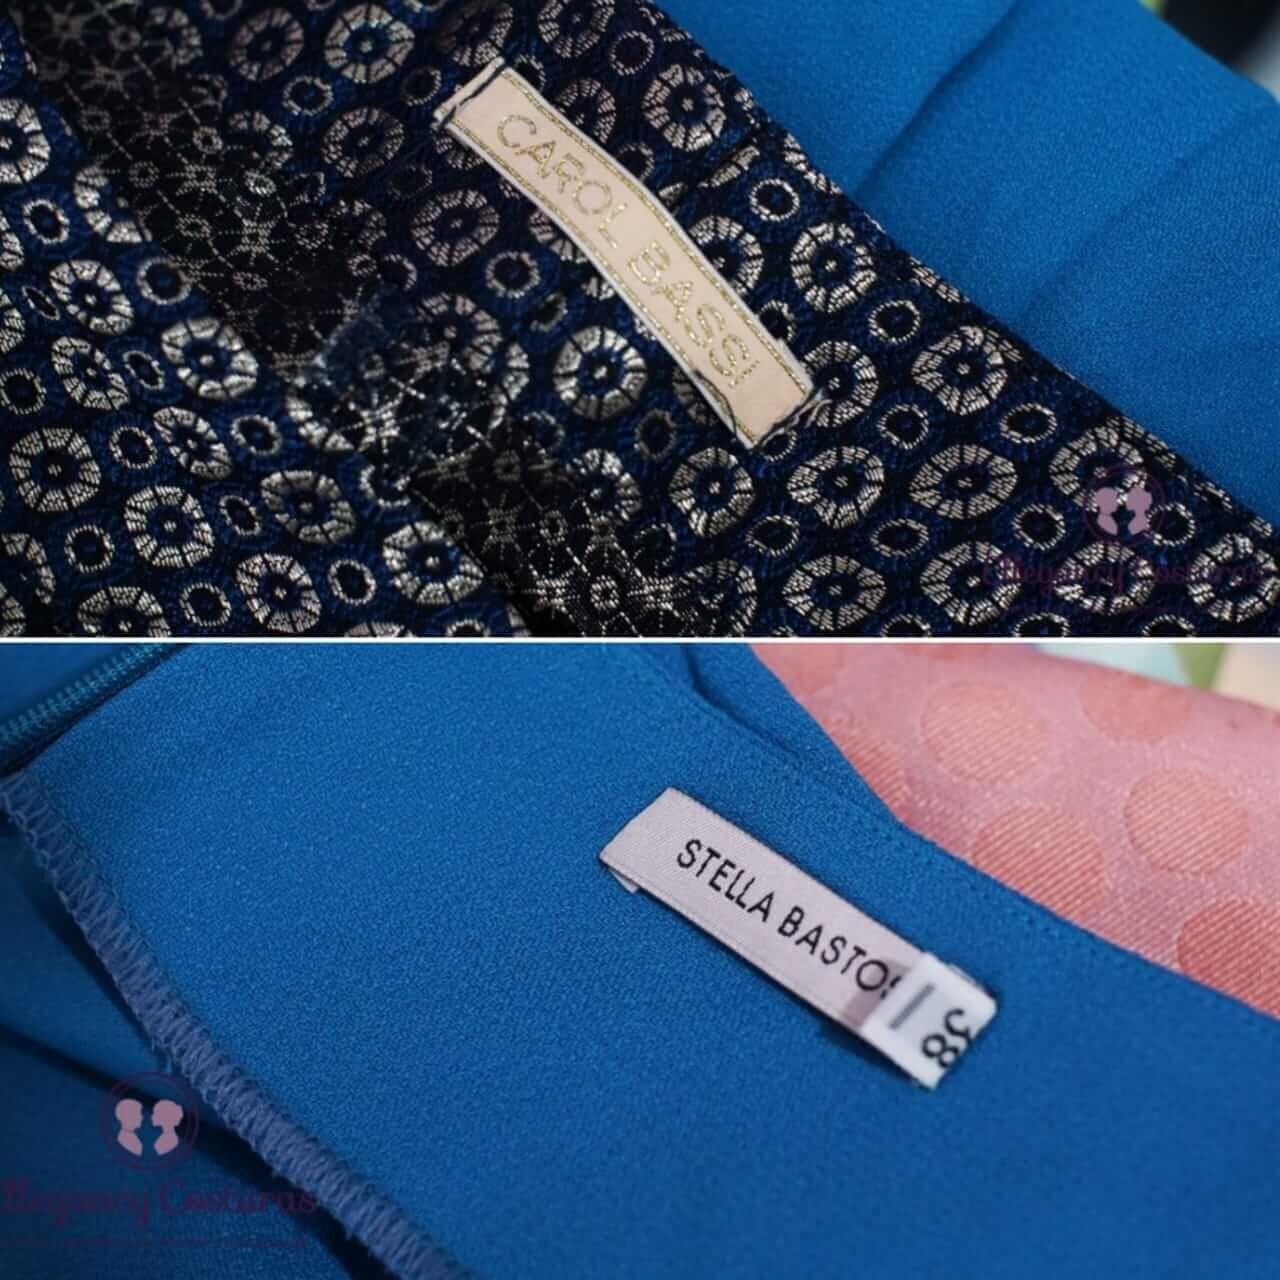 atelier-de-conserto-de-roupas-sp-1-2639540